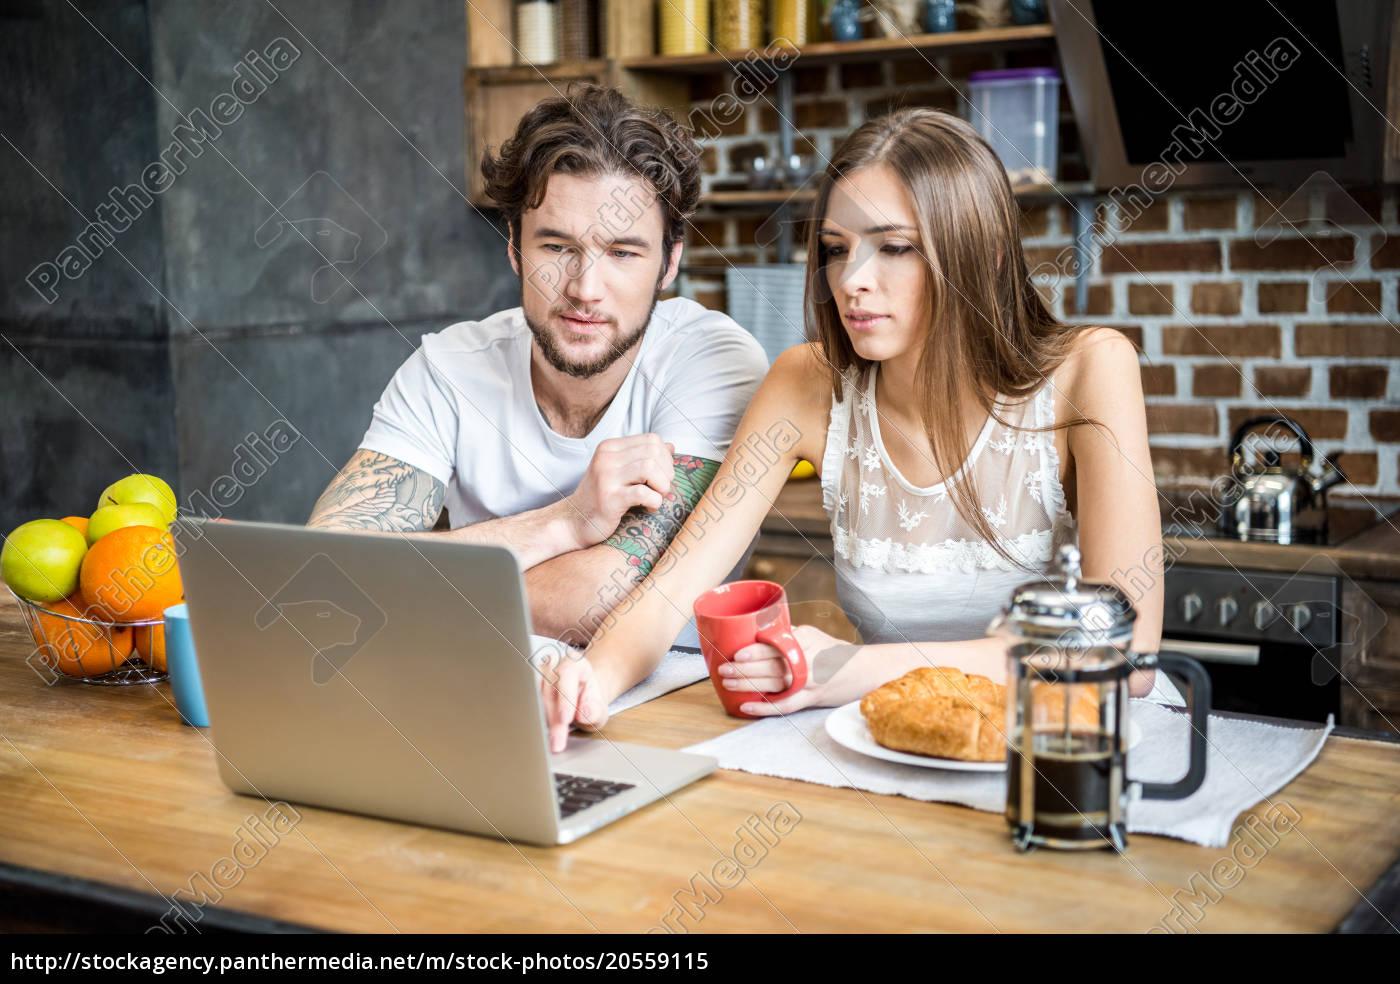 couple, using, laptop - 20559115